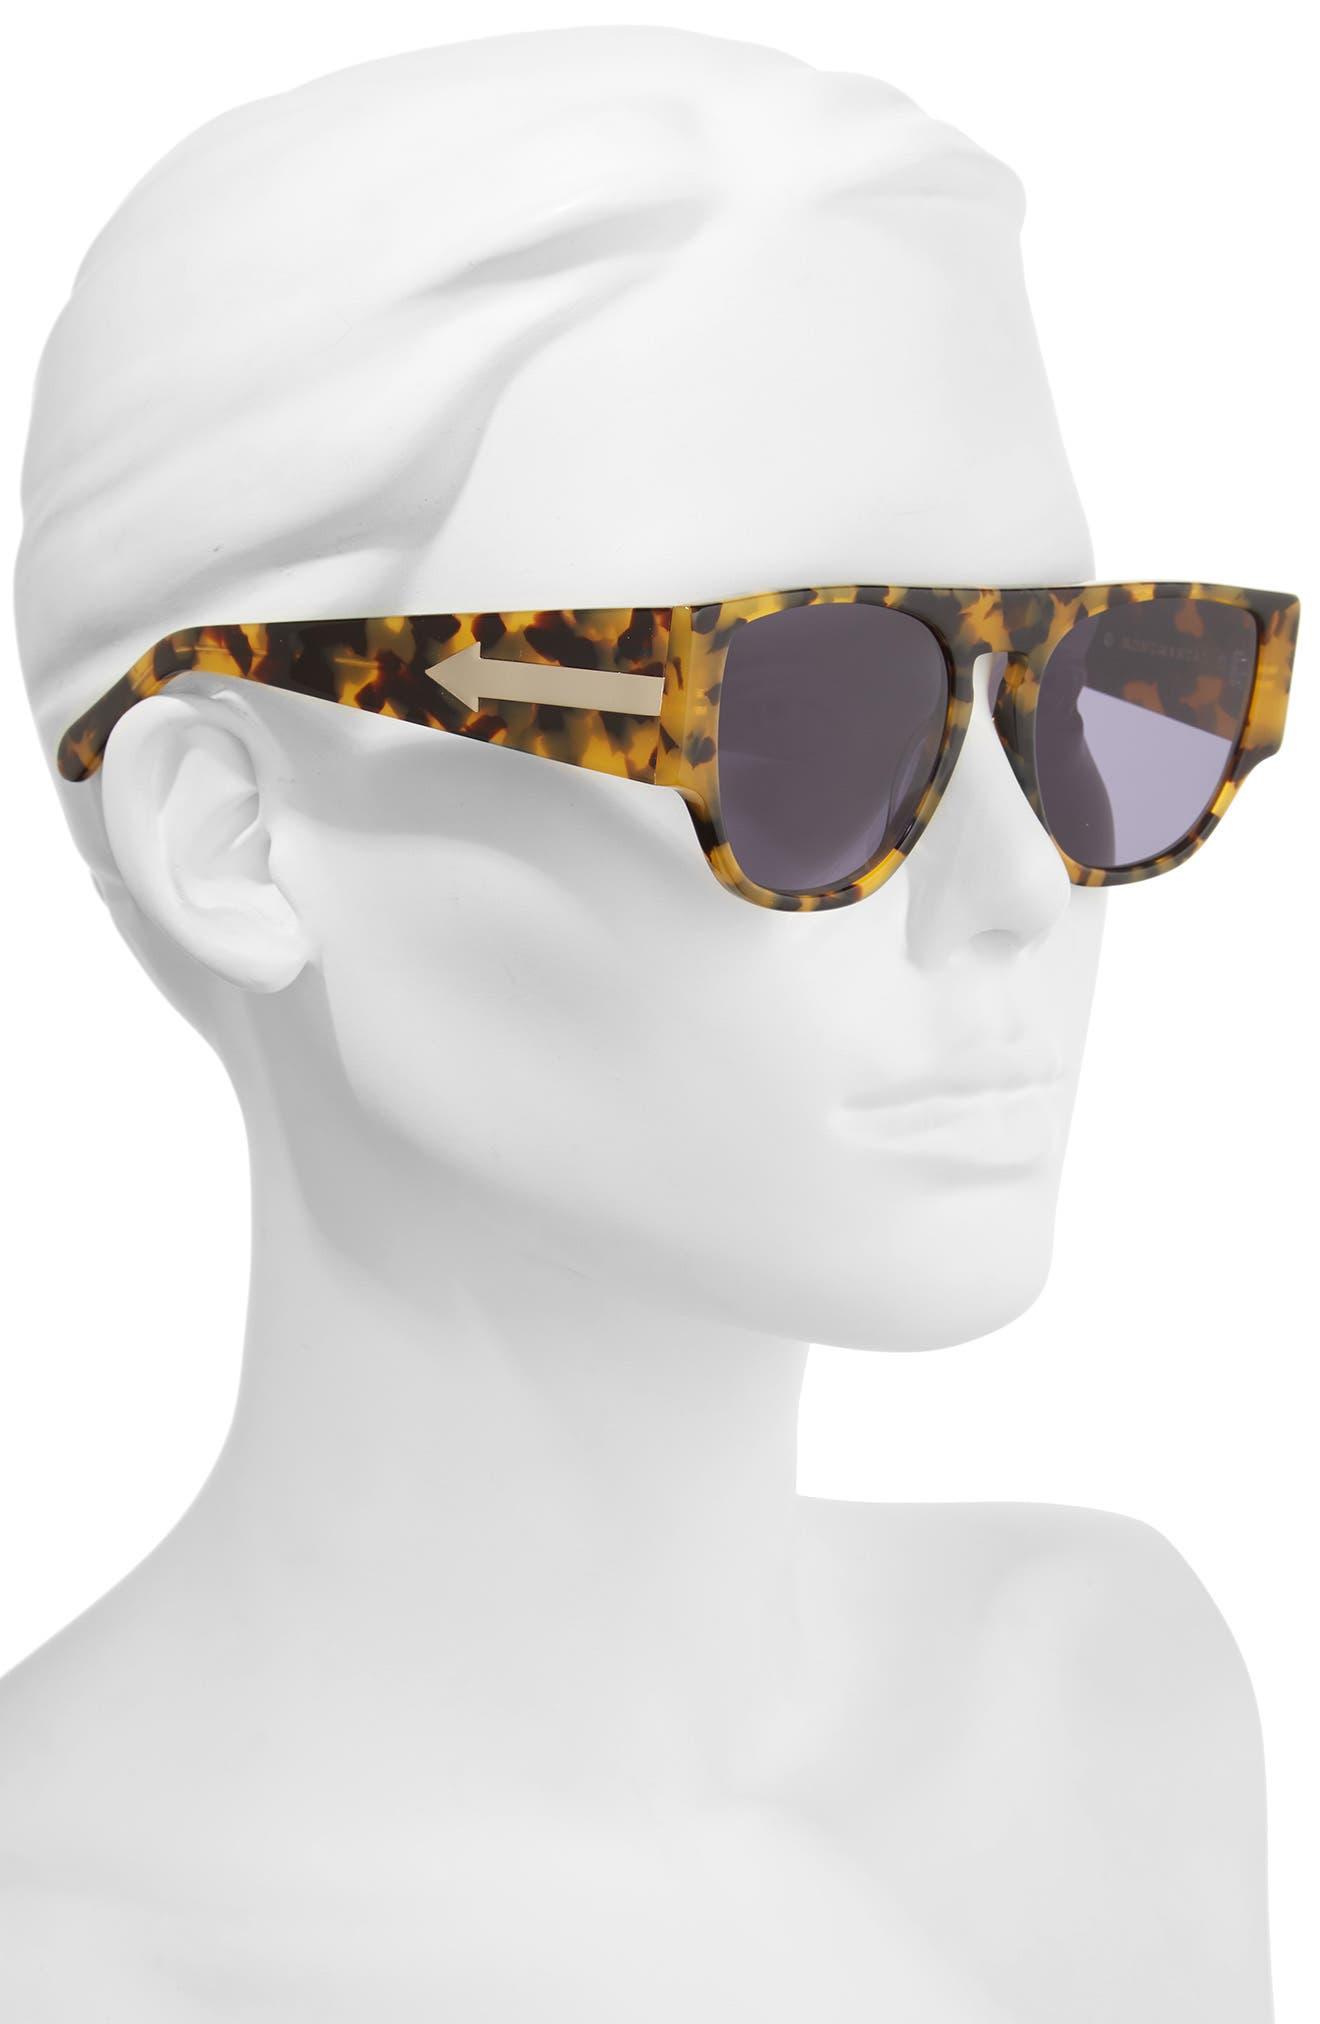 x Monumental Buzz 54mm Polarized Sunglasses,                             Alternate thumbnail 2, color,                             Crazy Tortoise